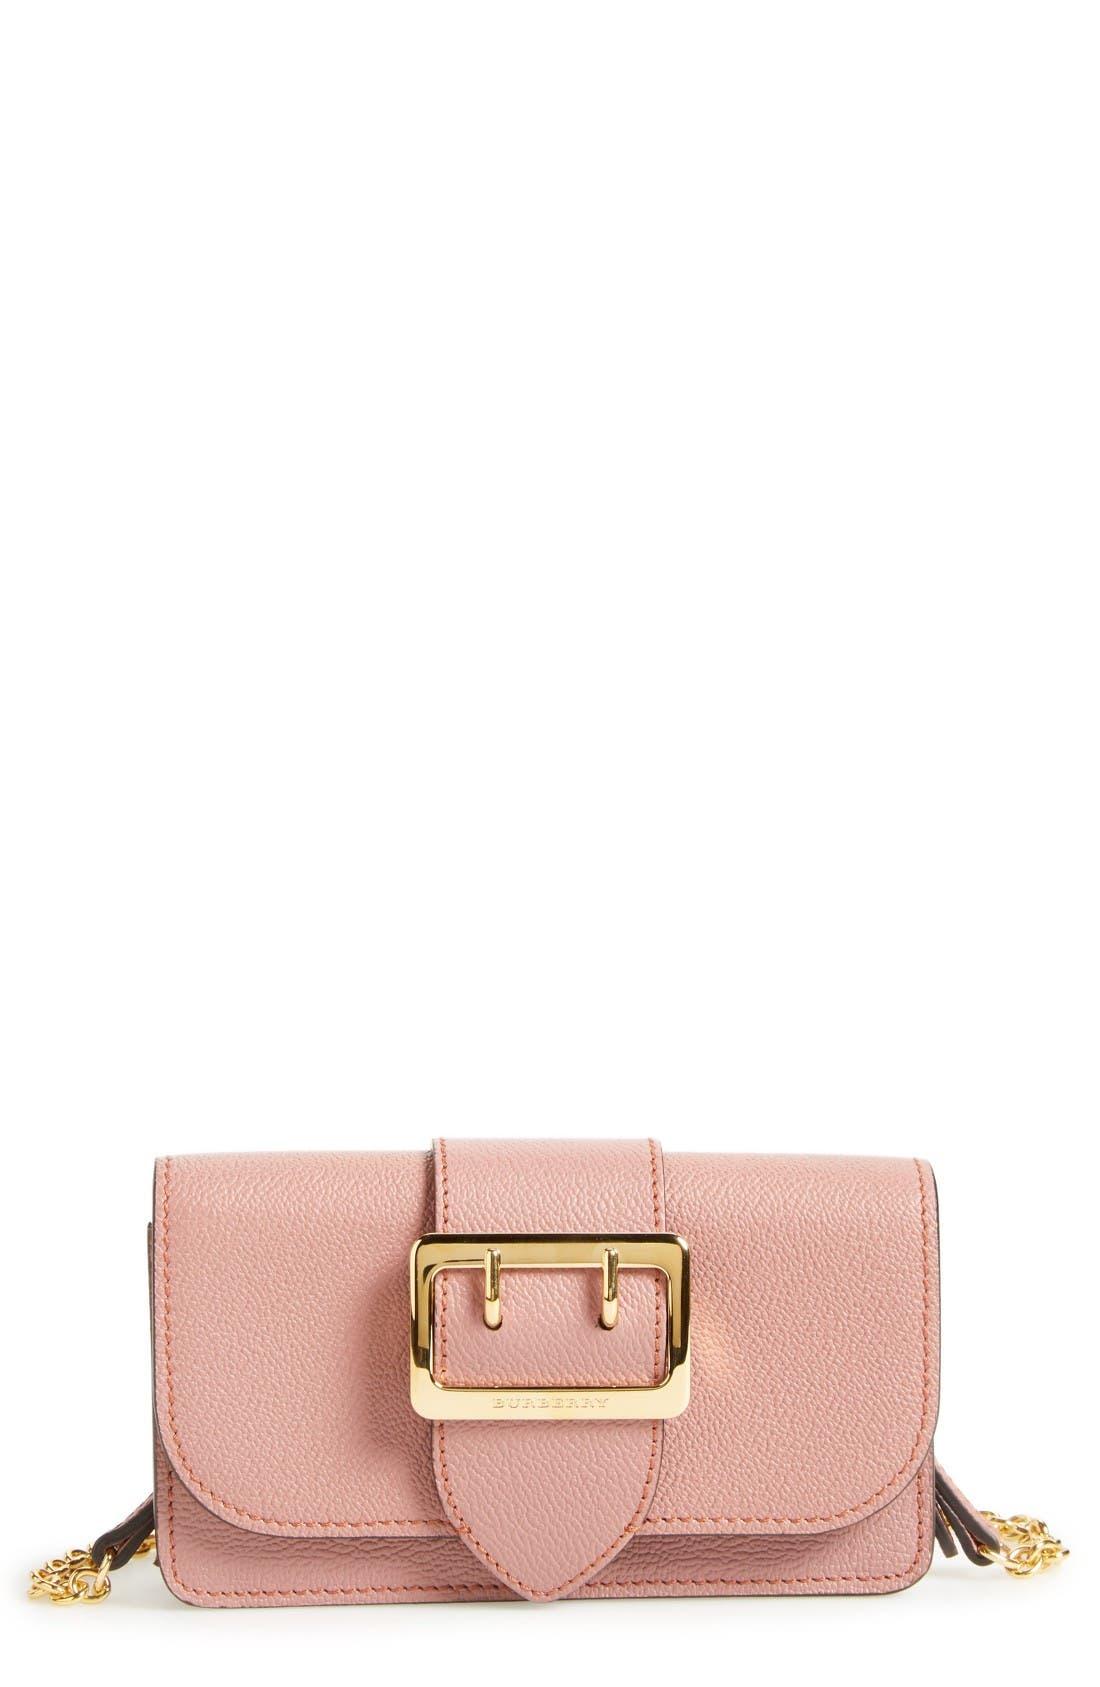 Burberry Mini Buckle Calfskin Leather Bag